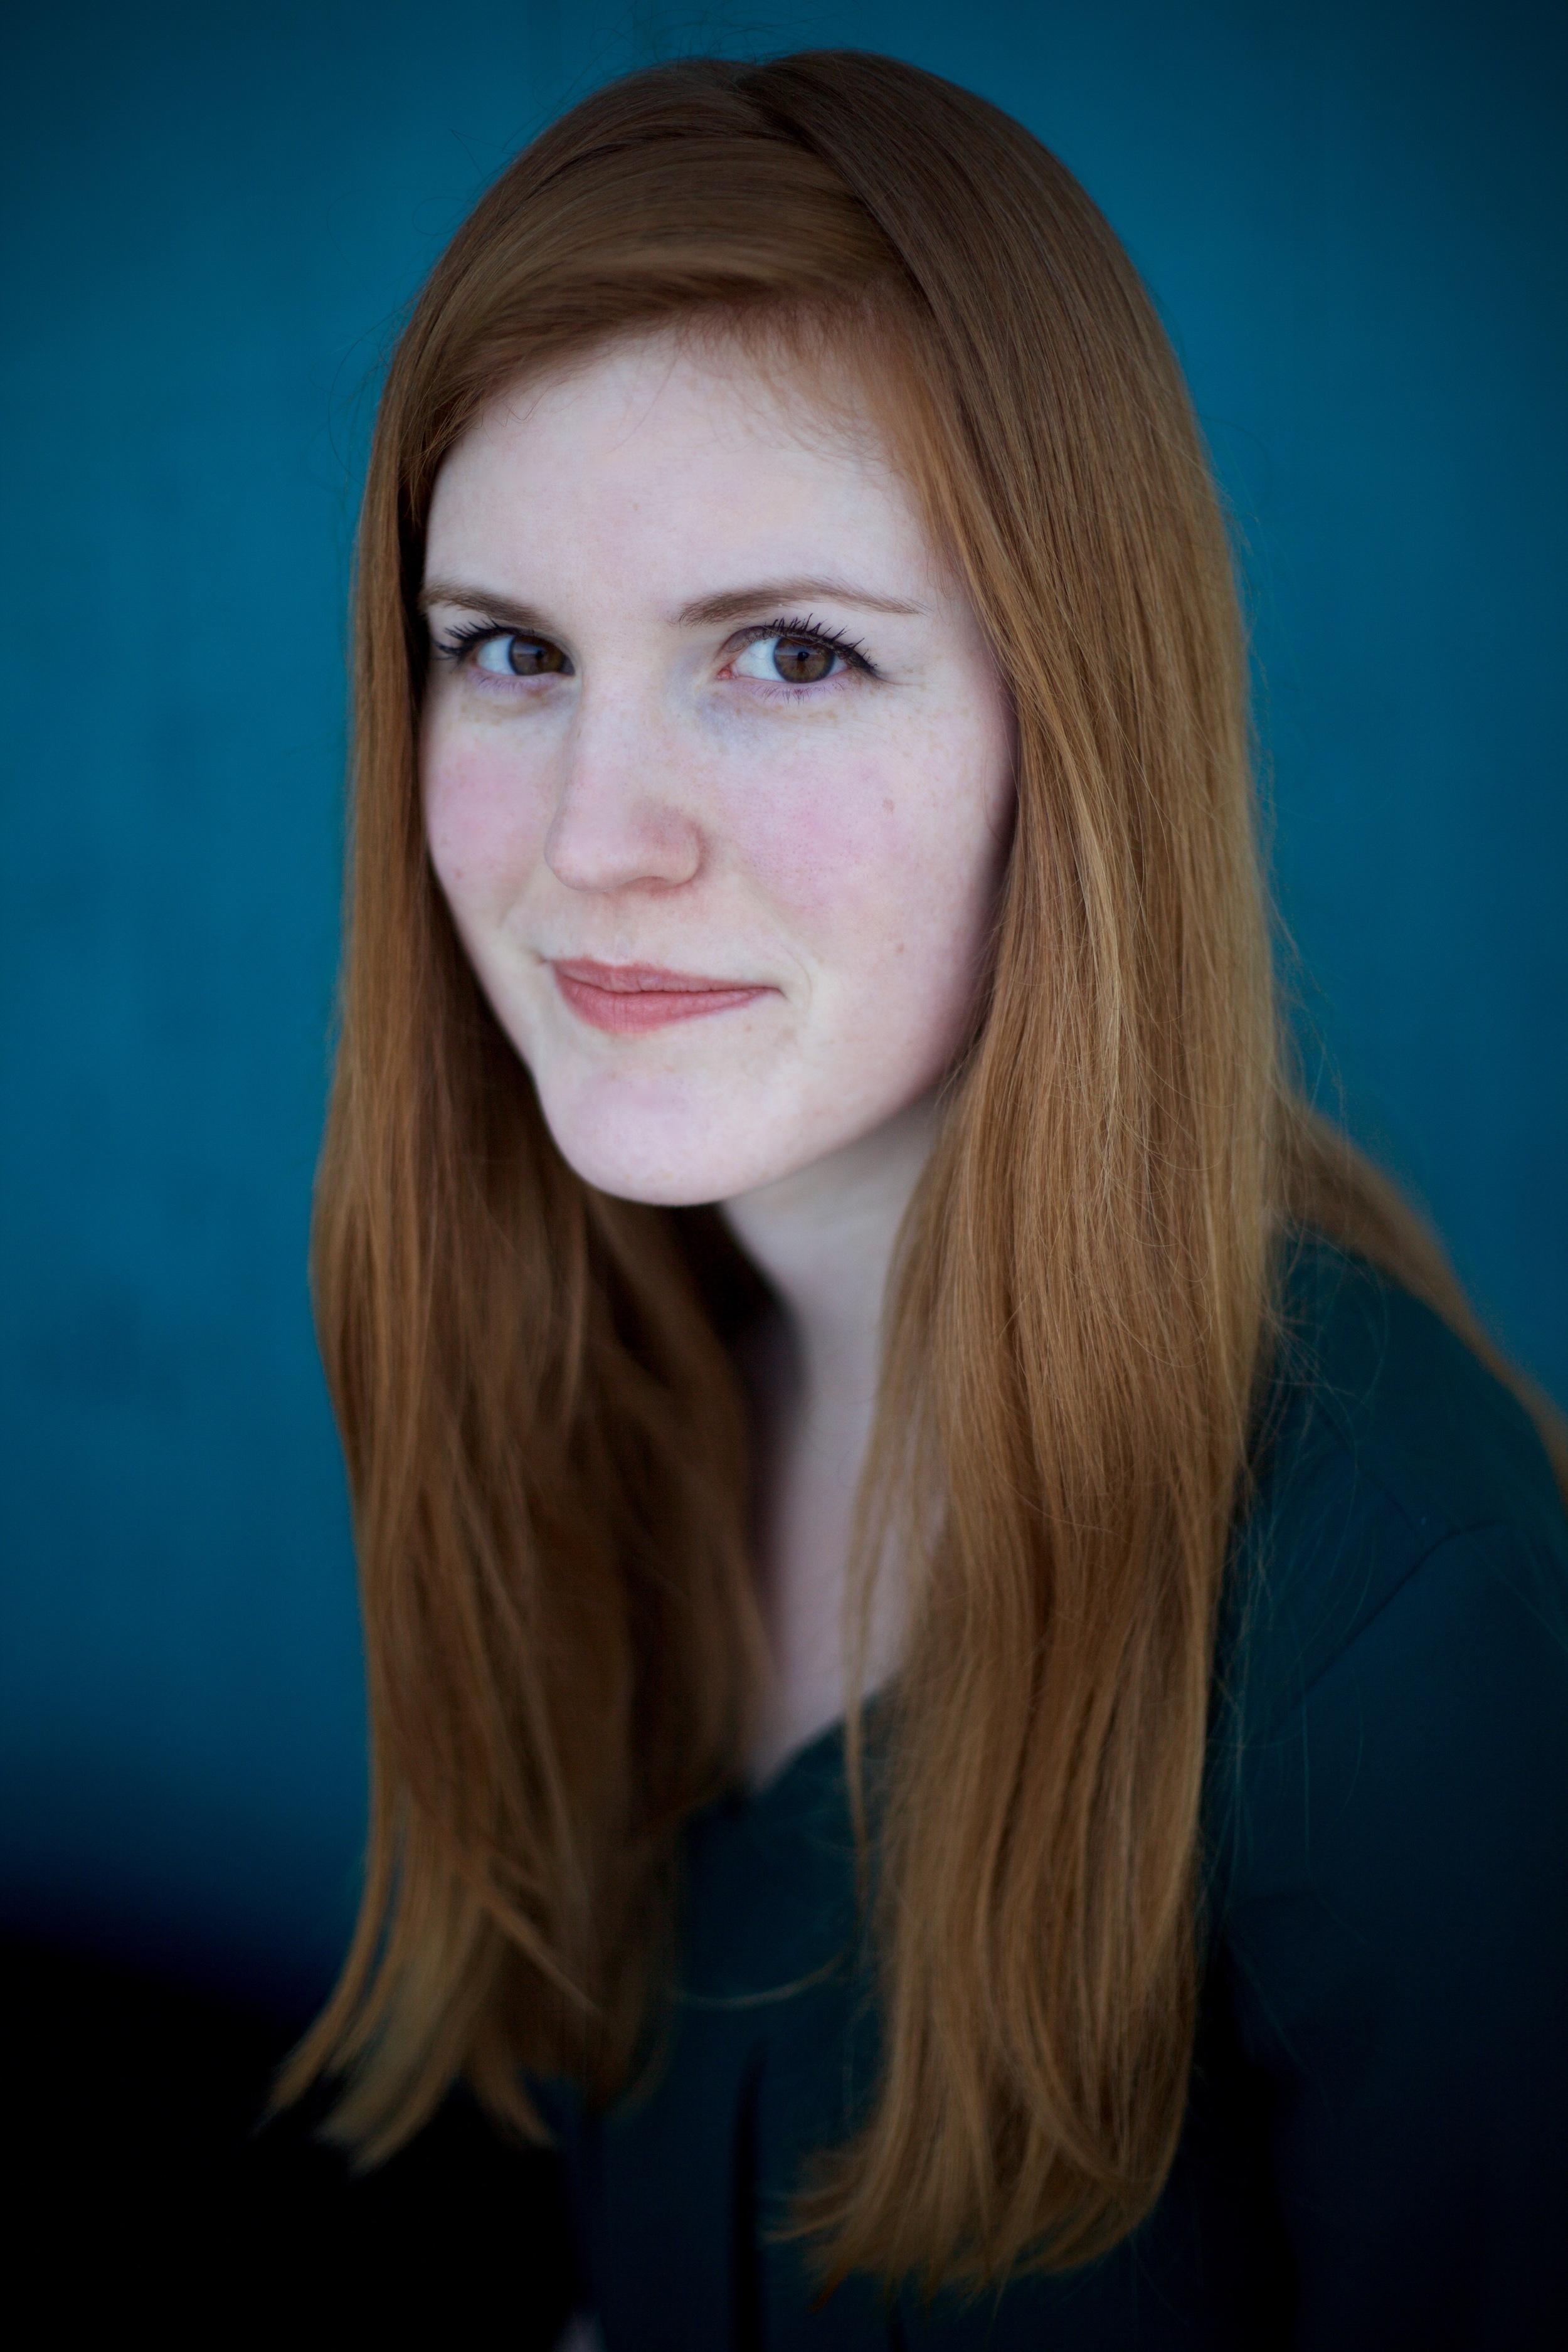 Meghan Hanet | Portrait | Headshot Photography| | Lifestyle Photoshoot | Alberta Photographer | YYC | Lauren Hamm Photography